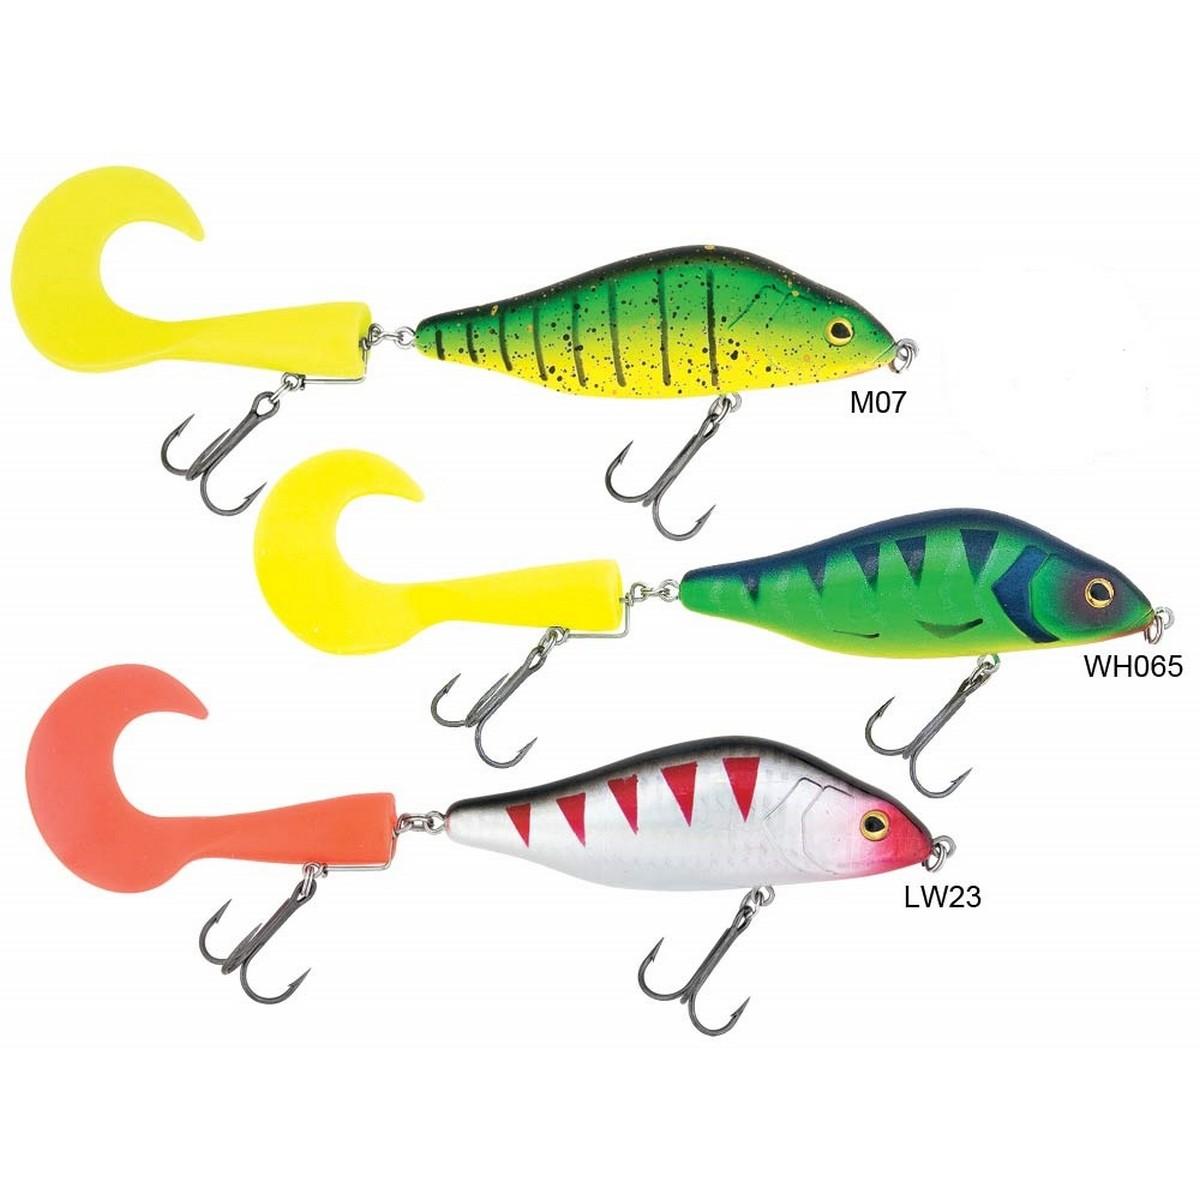 Воблер Baracuda Jerk Soft Tail